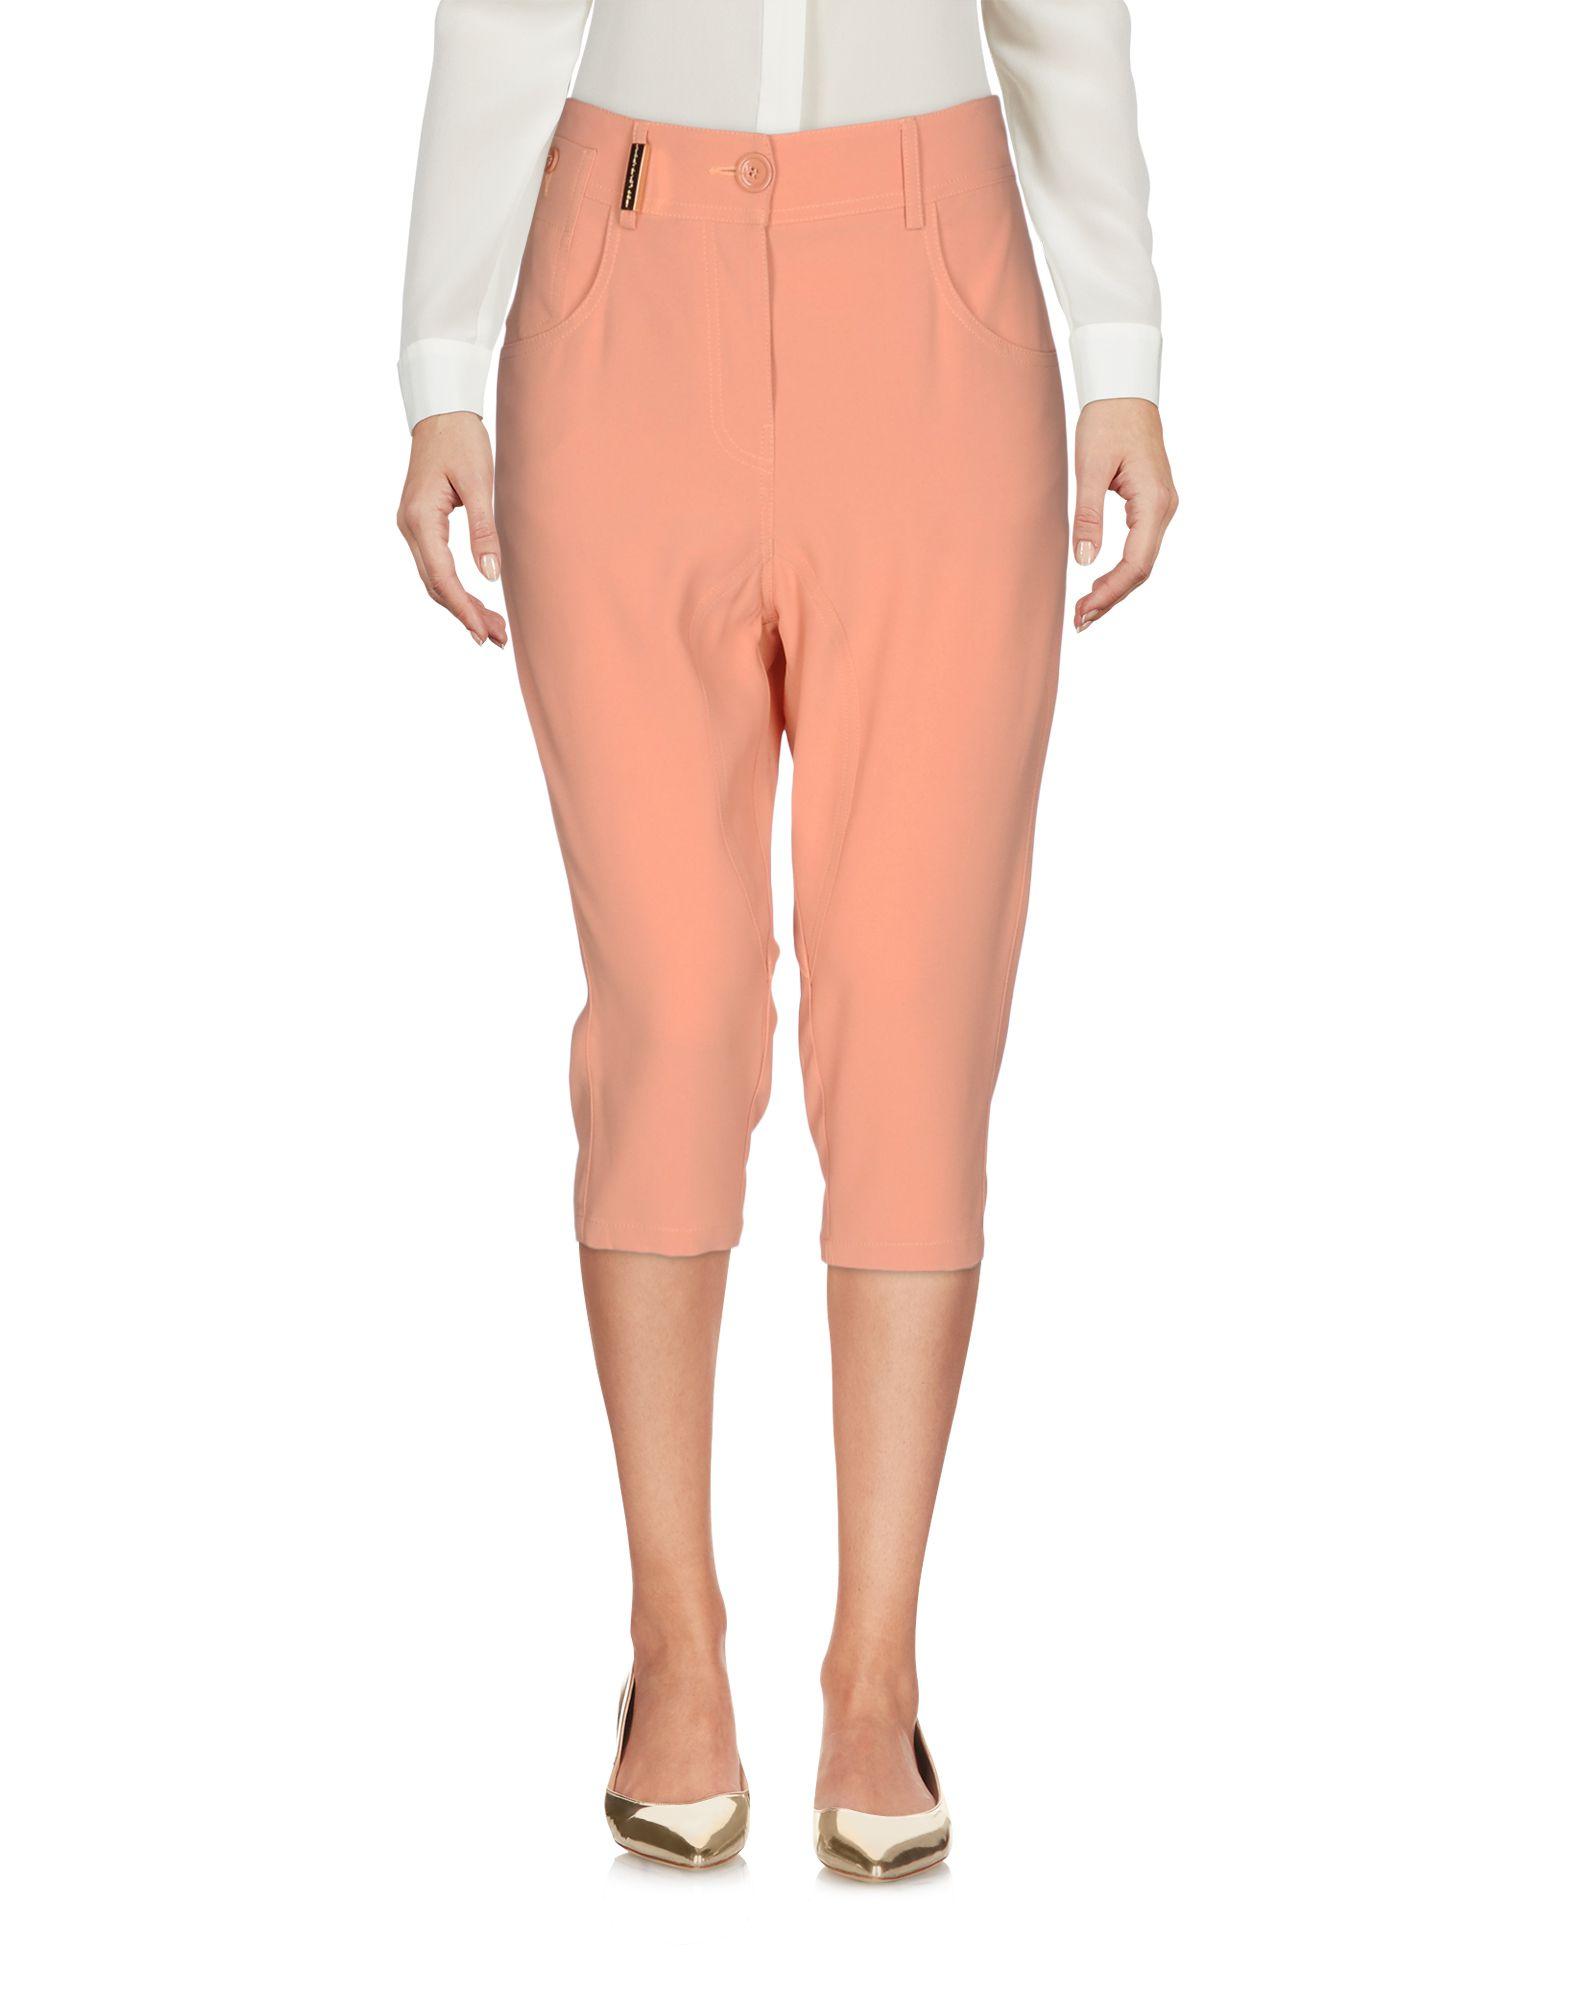 Pantalone Taperosso Atos Lombardini Lombardini Lombardini donna - 36983845OK 7cb